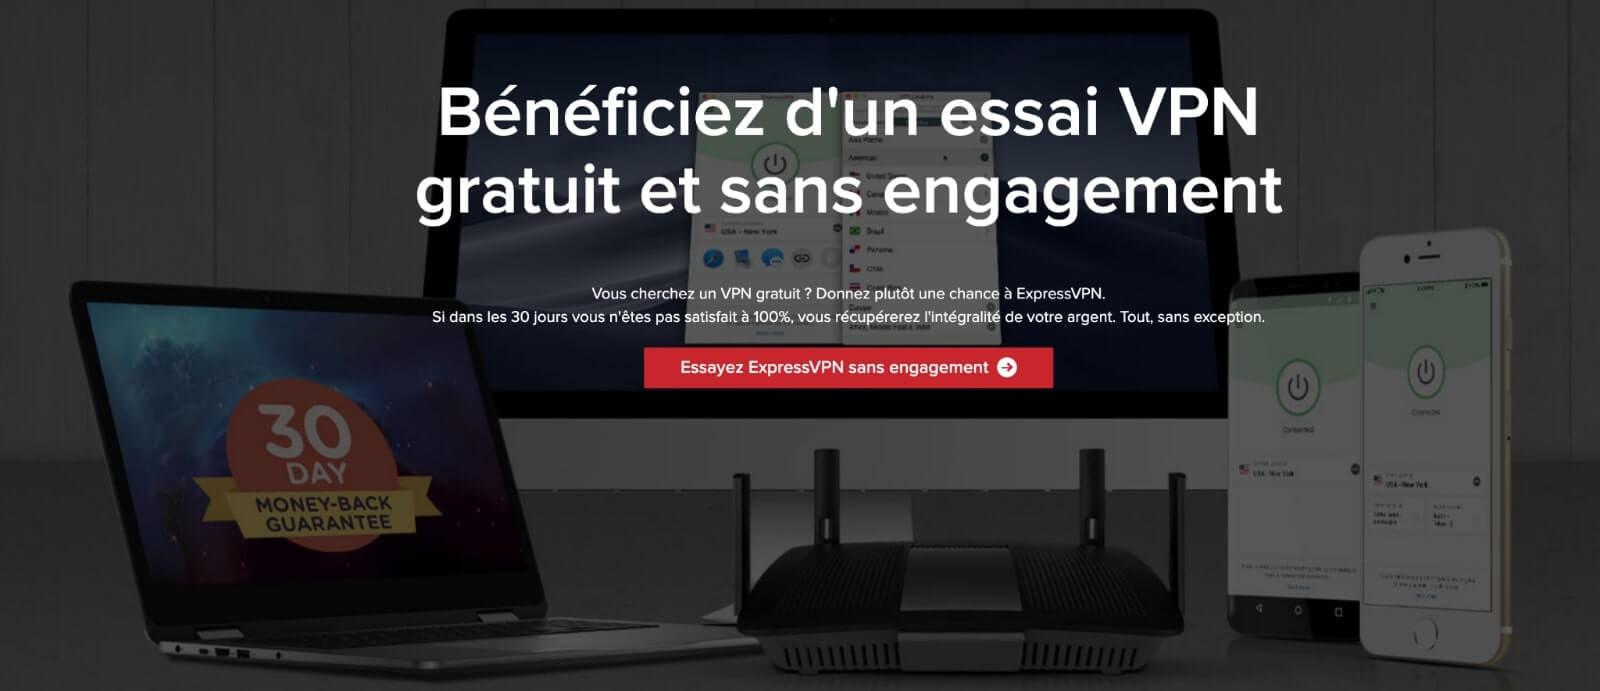 ExpressVPN VPN gratuit